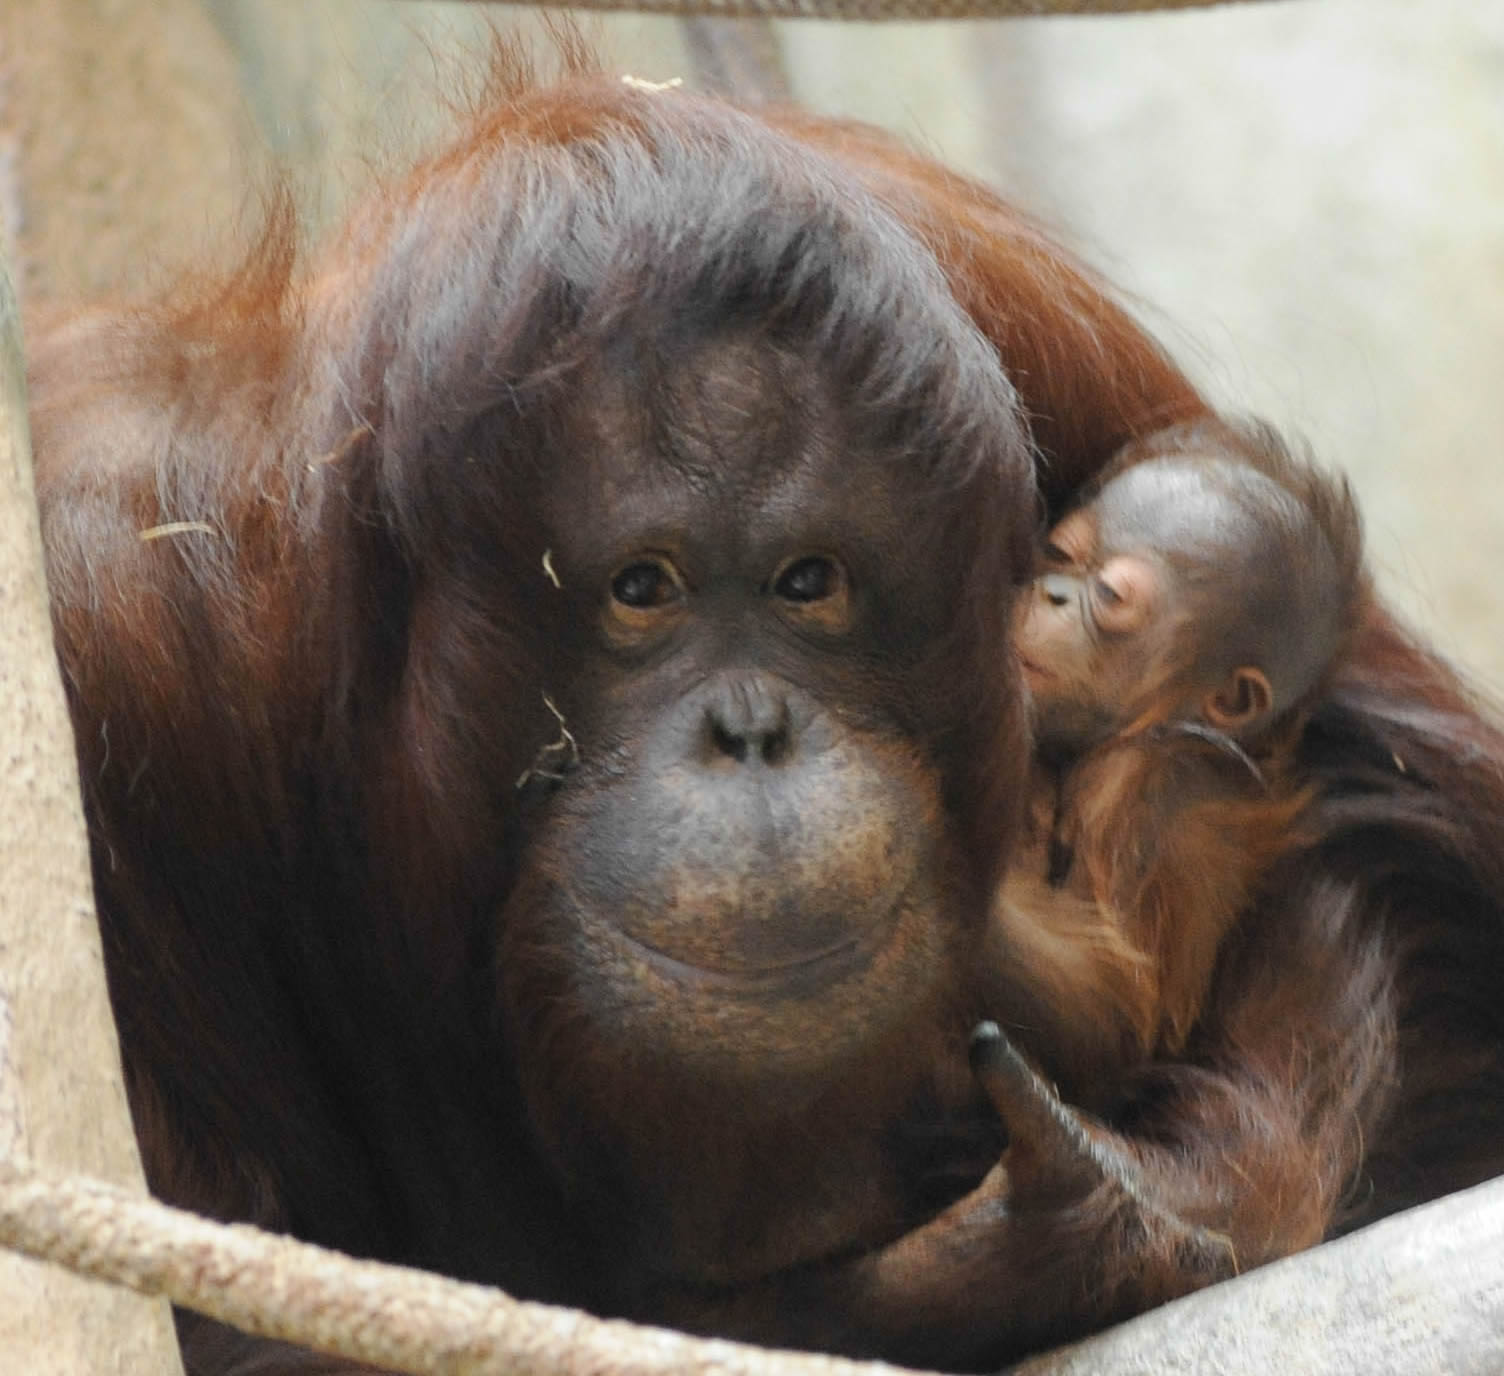 Smiling baby orangutan - photo#1